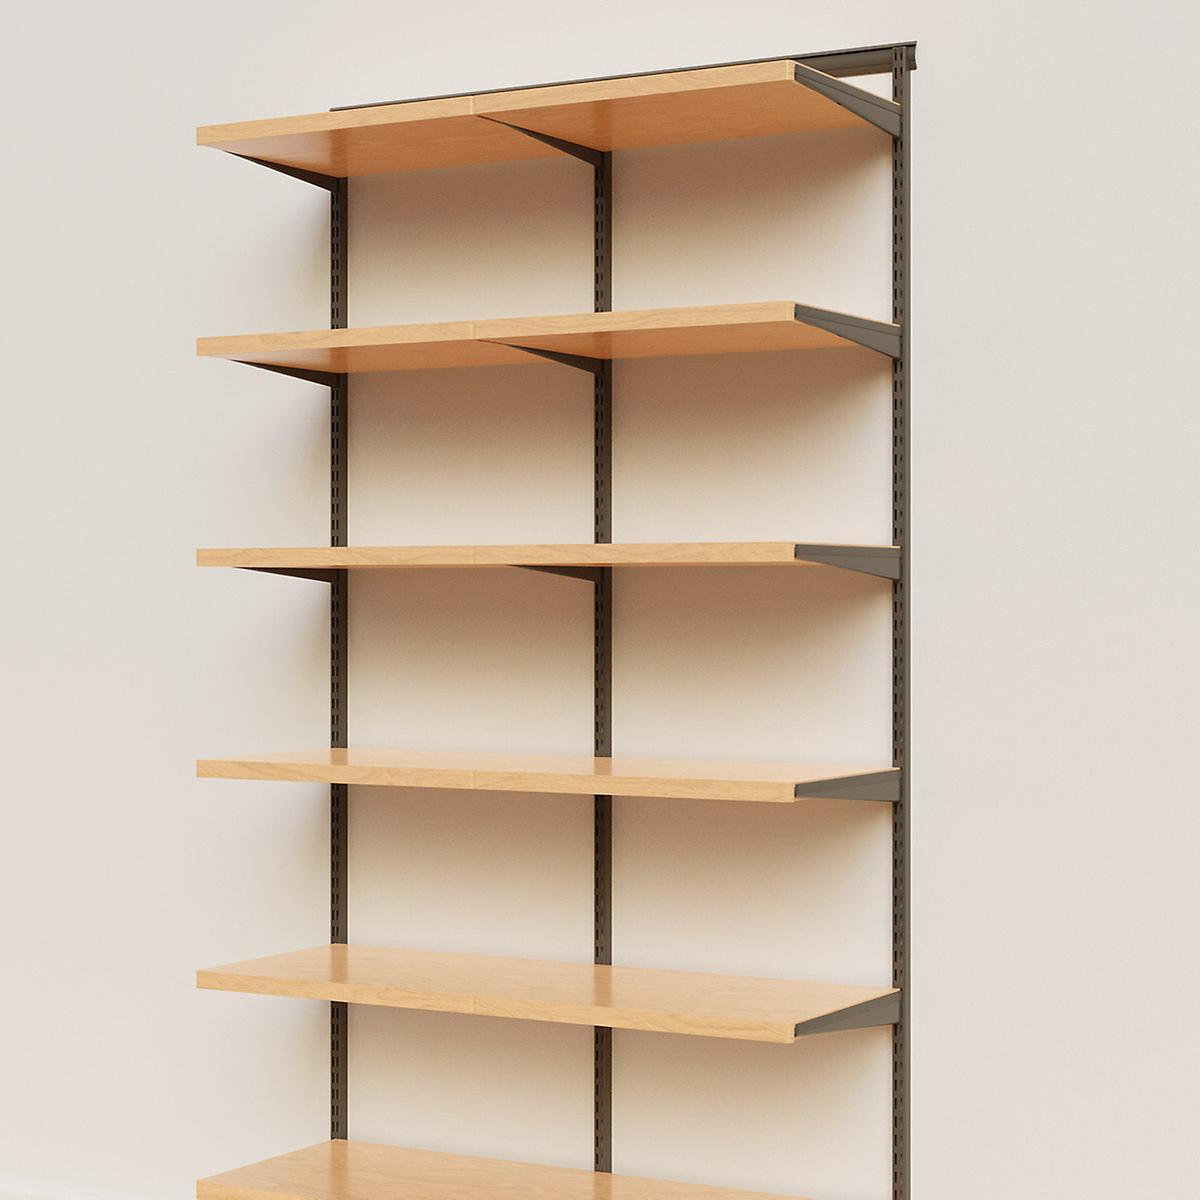 Elfa Décor 4' Graphite & Birch Basic Shelving Units for Anywhere